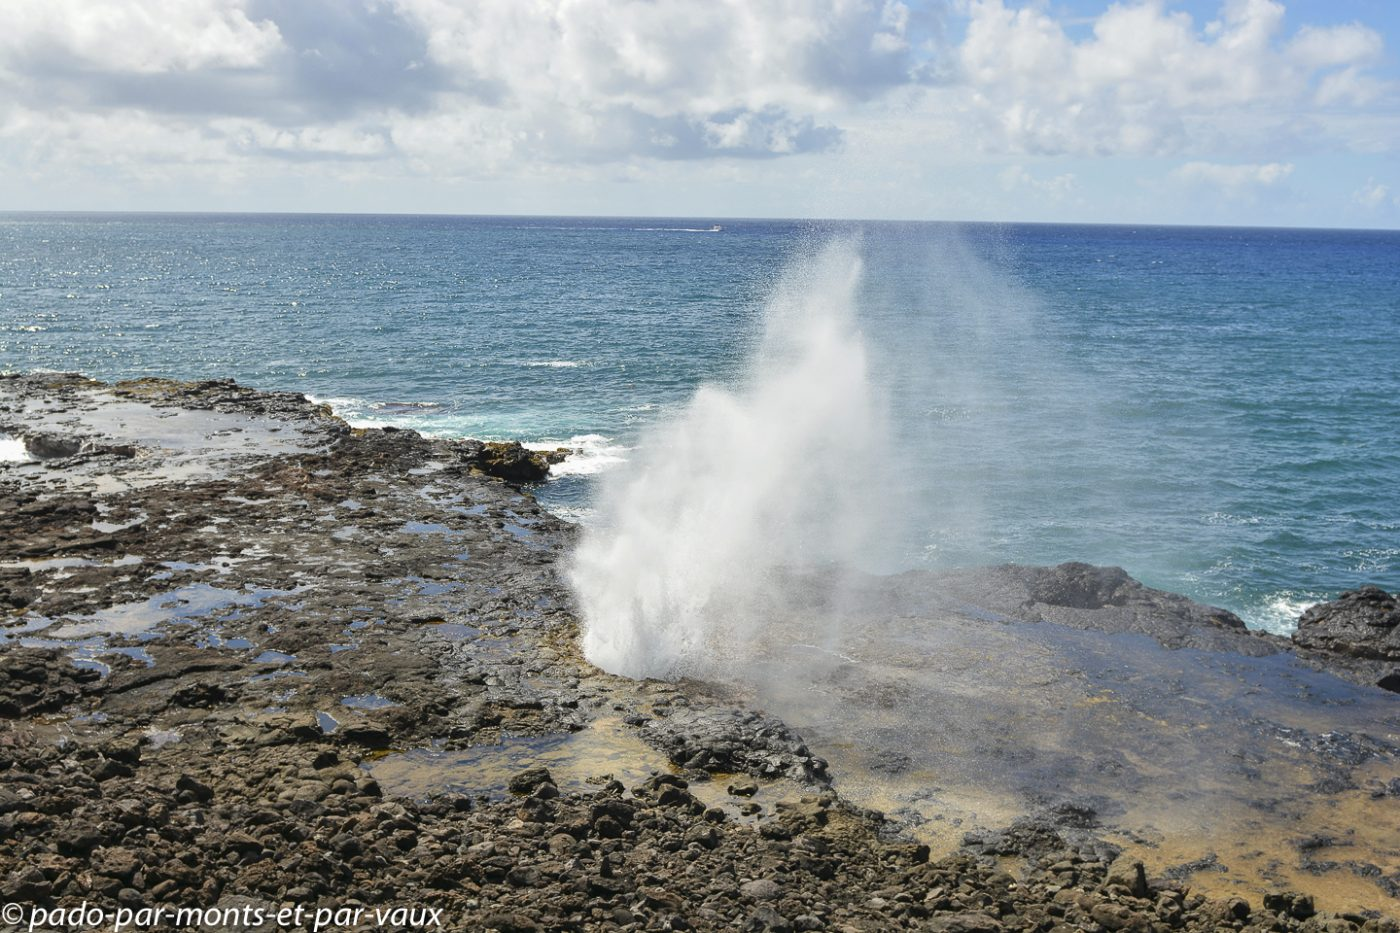 Kauai - Spouting horn beach park